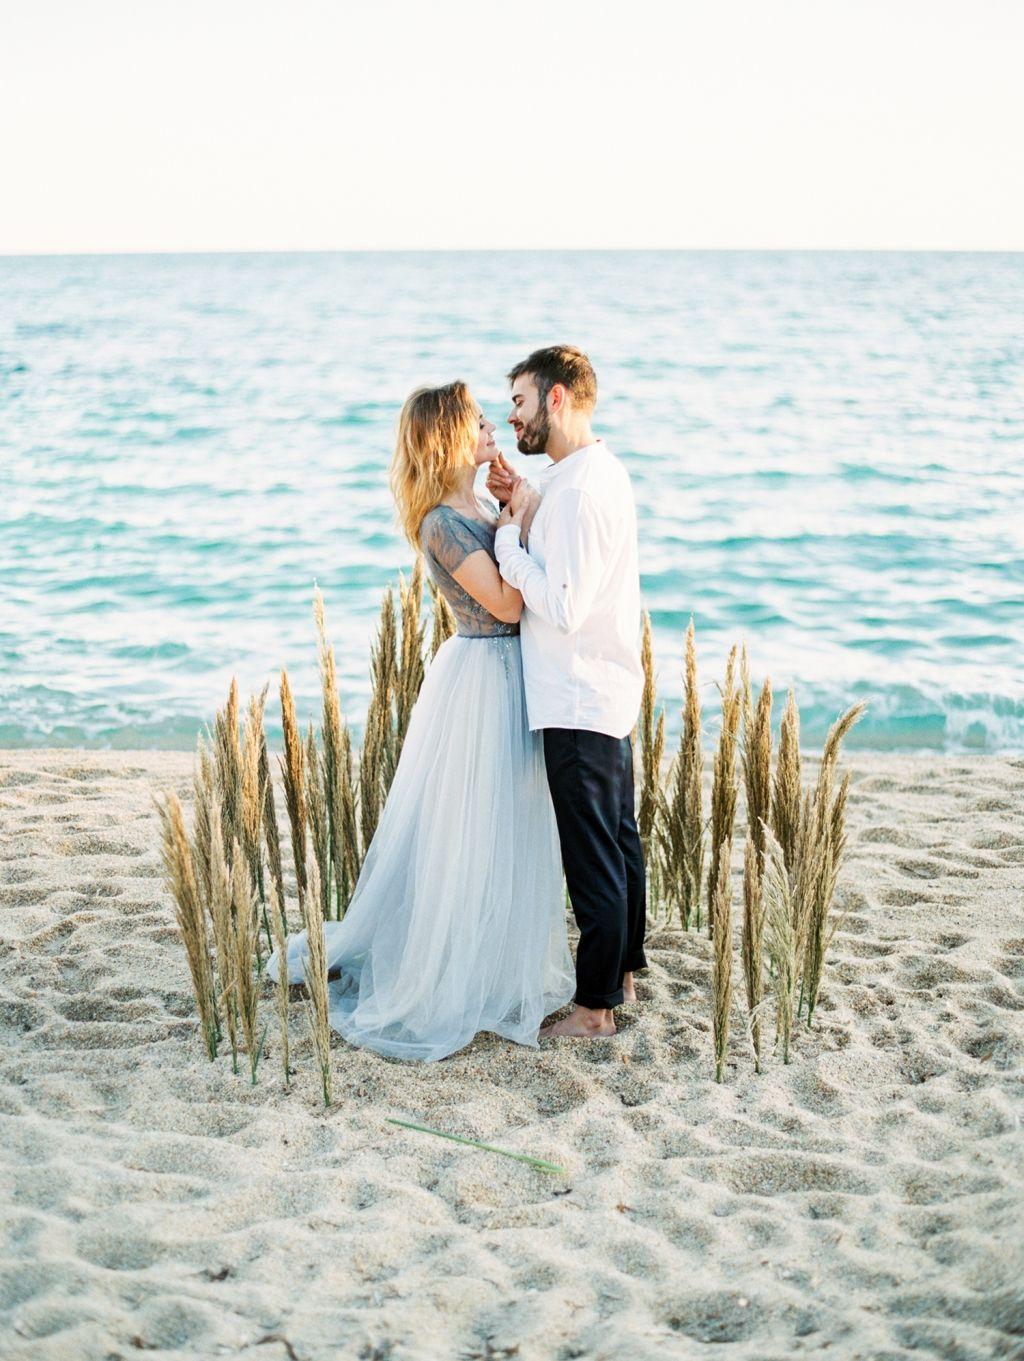 Relaxed beach wedding  Beautifully elegant coastal wedding inspiration from Spain